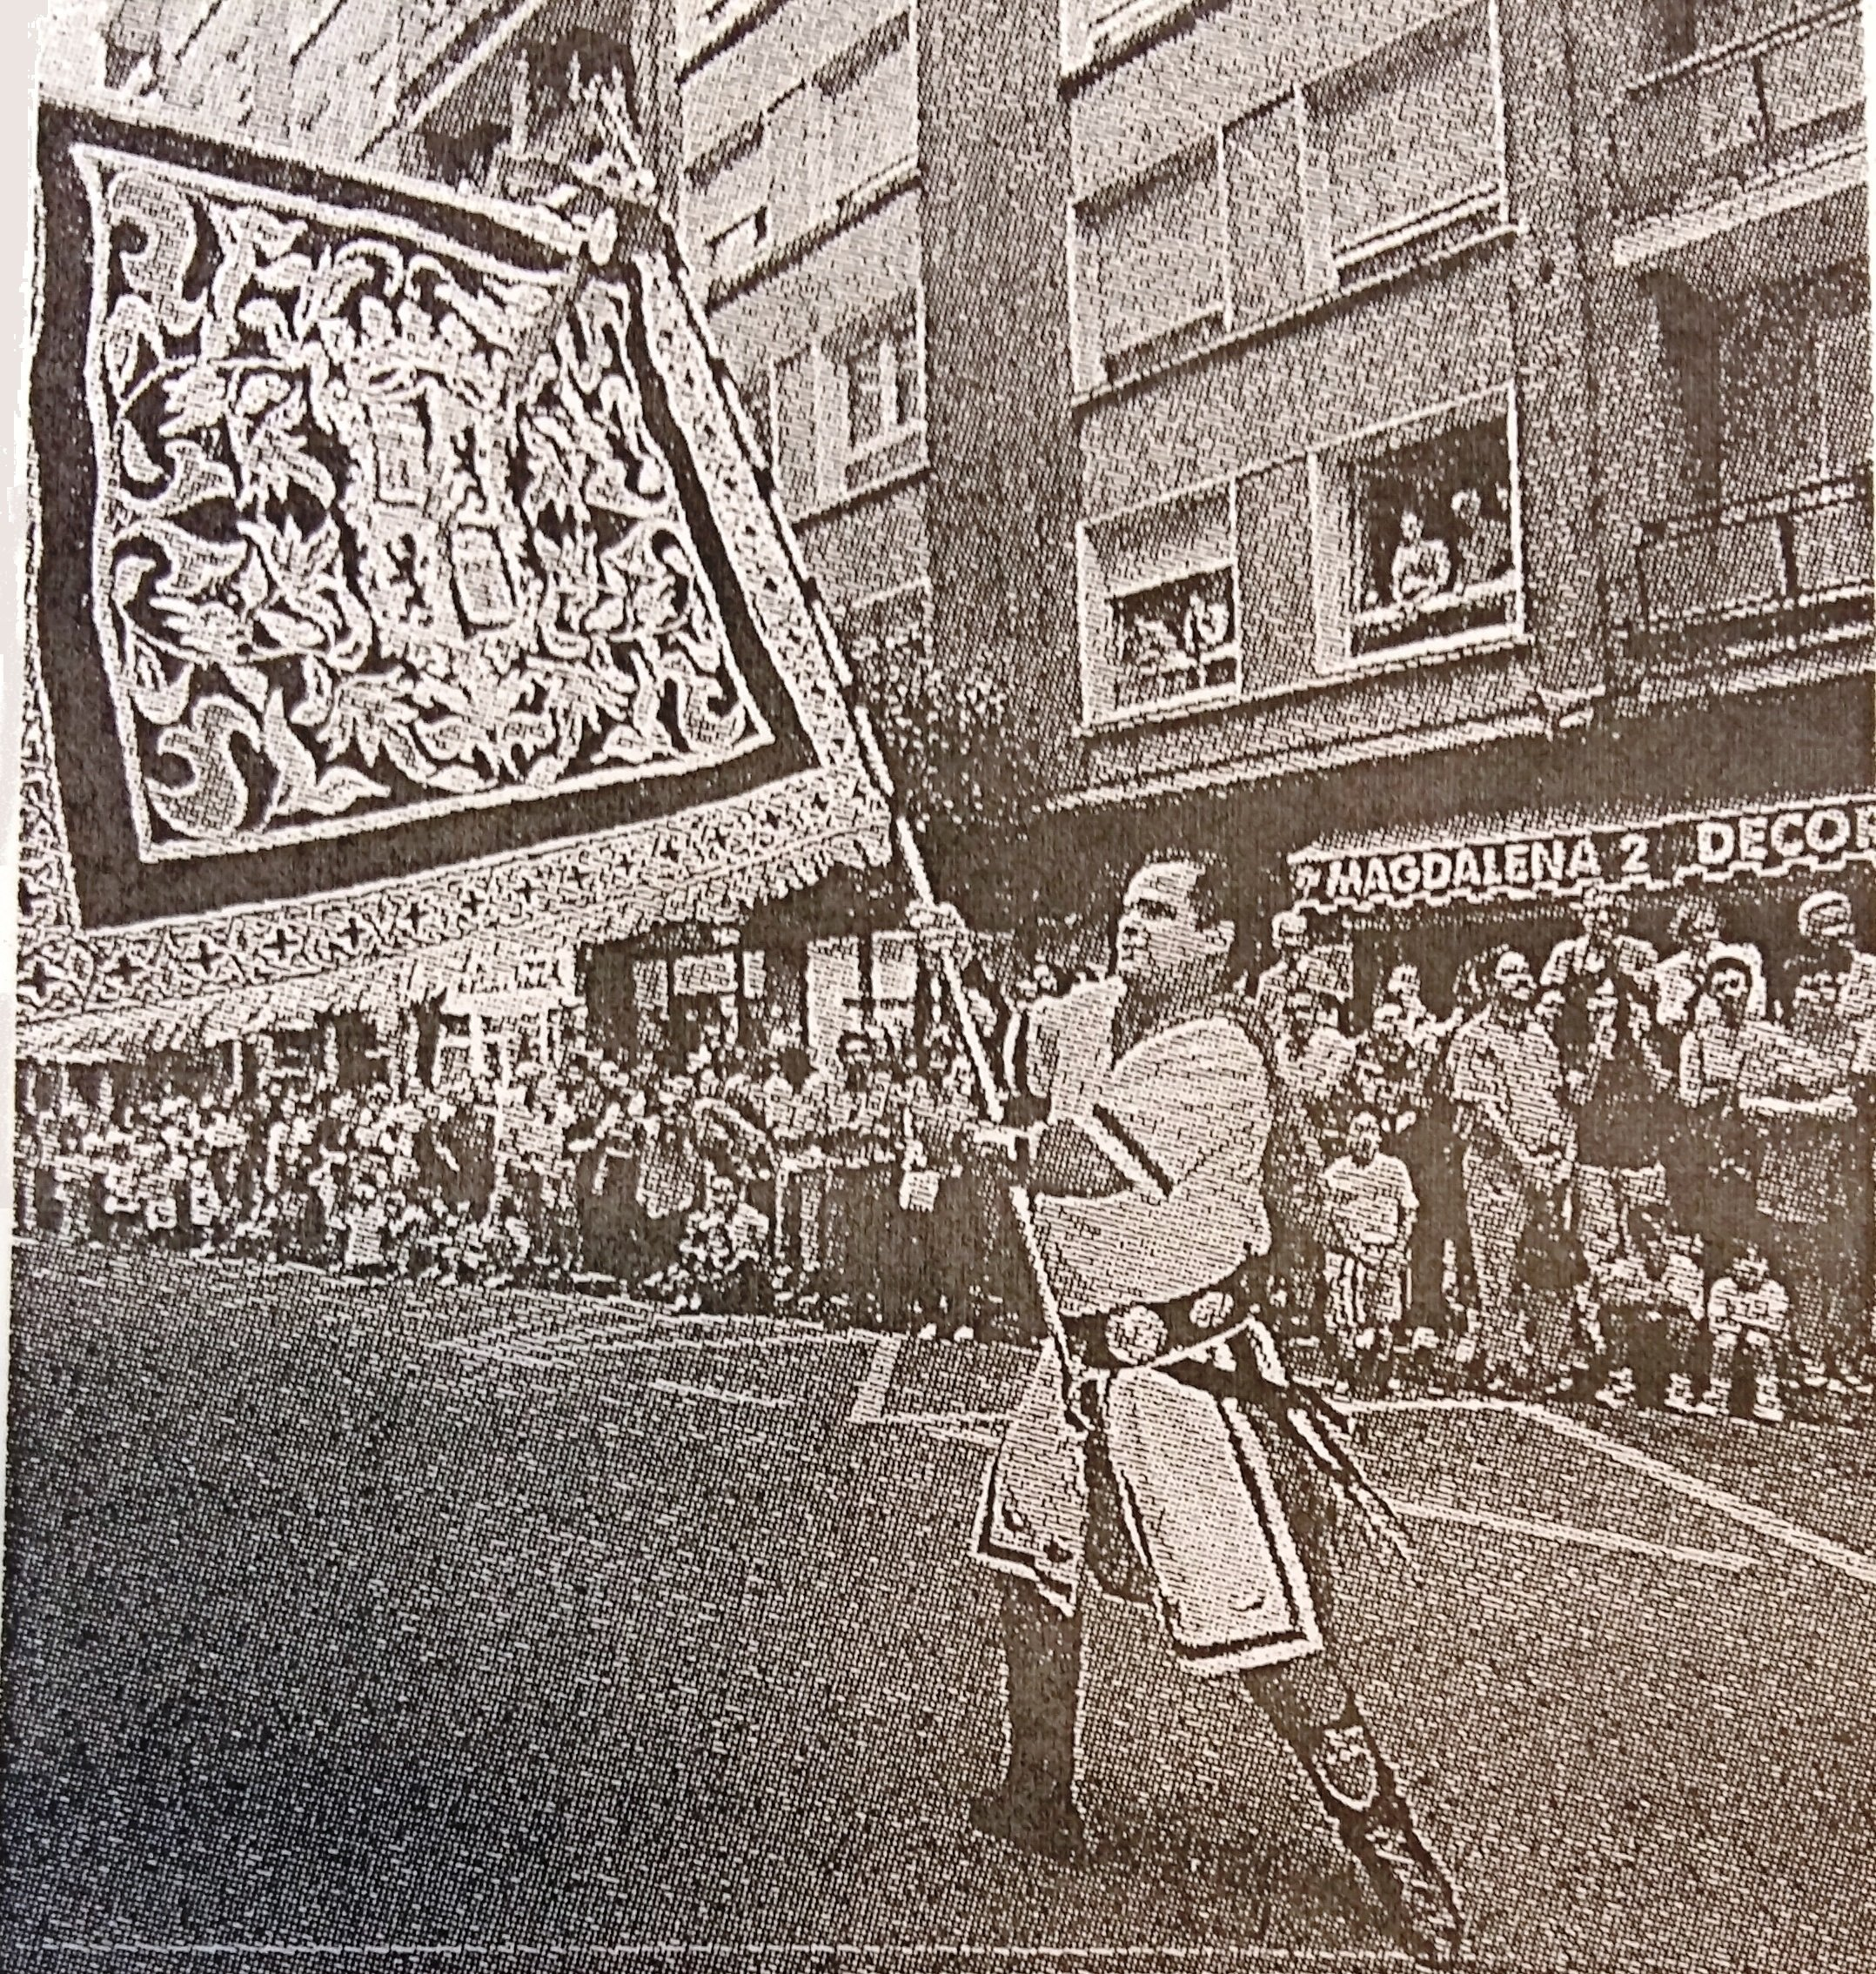 desfile moros 2001